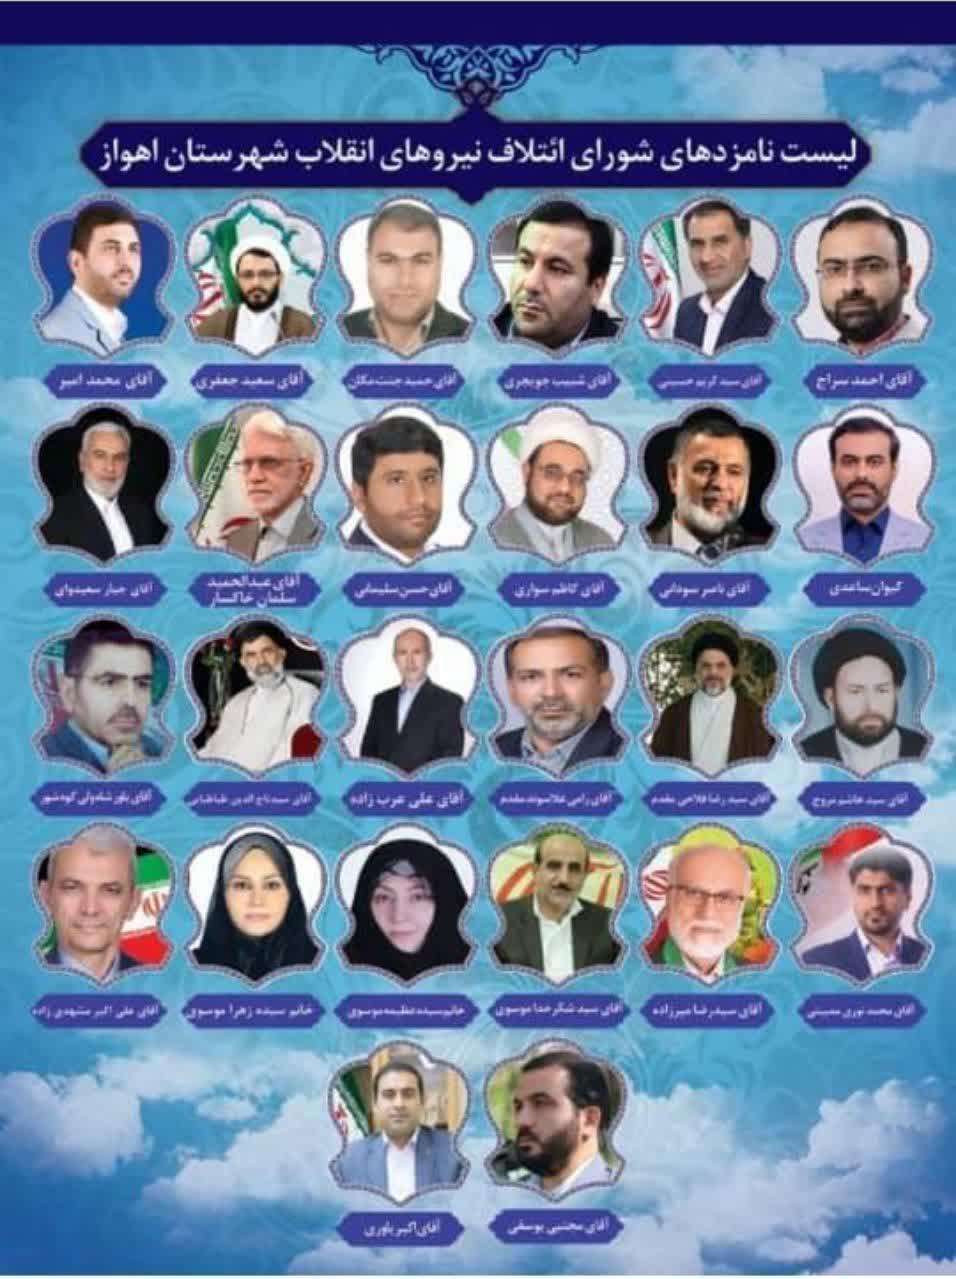 jamna ahvaz چرا ائتلاف نیروهای انقلاب اهواز با هوادارانش صادق نیست؟